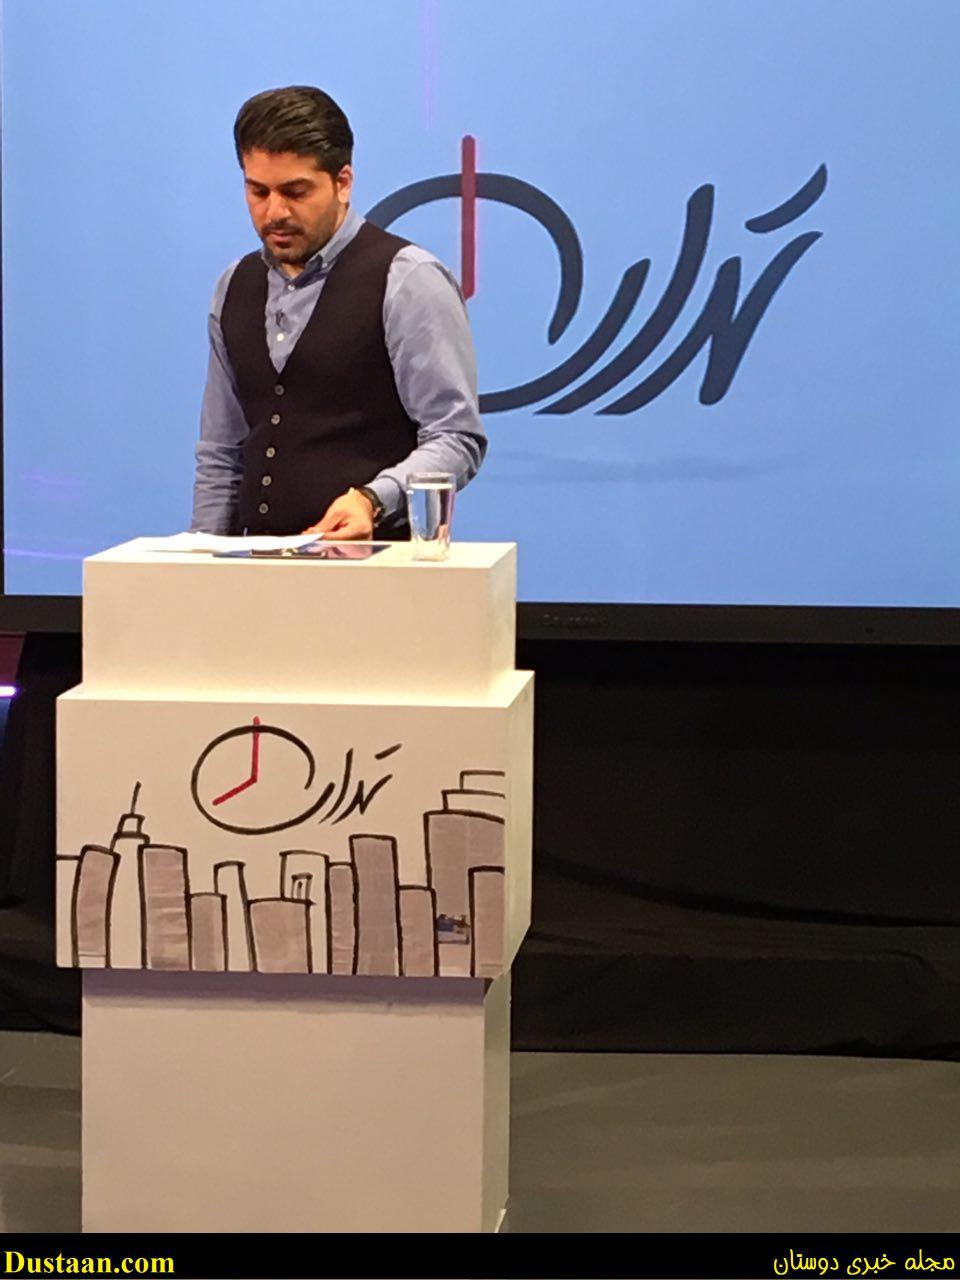 www.dustaan.com عکس: مجری برنامه جنجالی شبکه ۵ تغییر کرد!